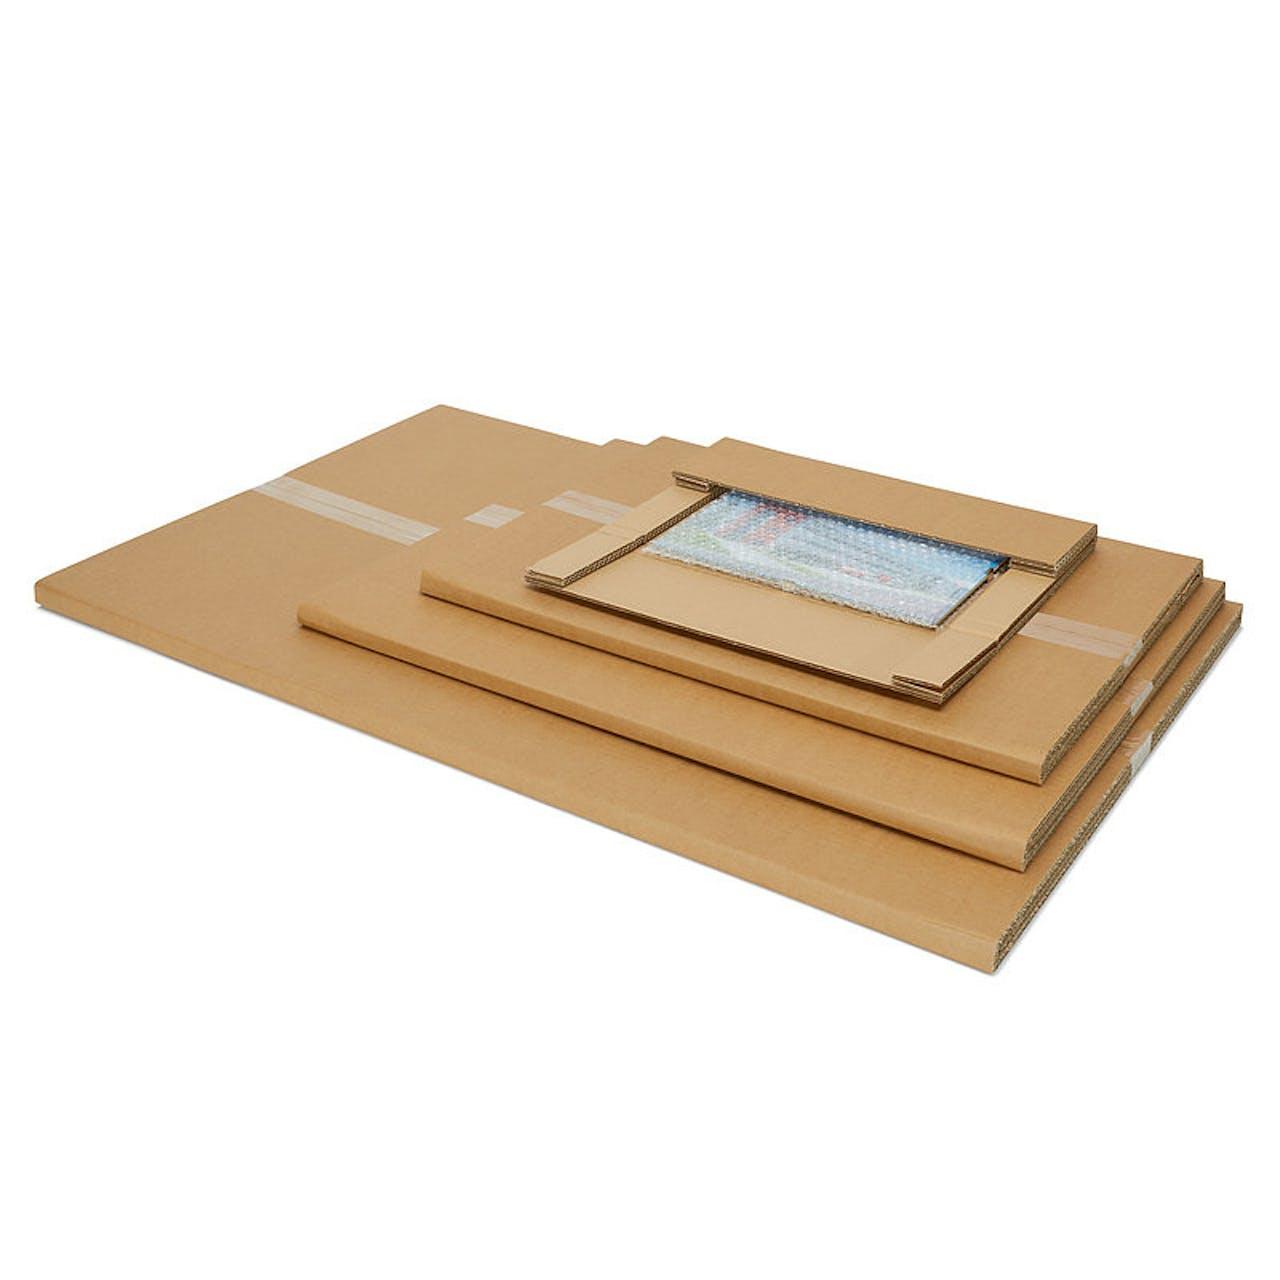 Bilderverpackung, 930 x 630 x 16 mm, 648 g, 1-wellig